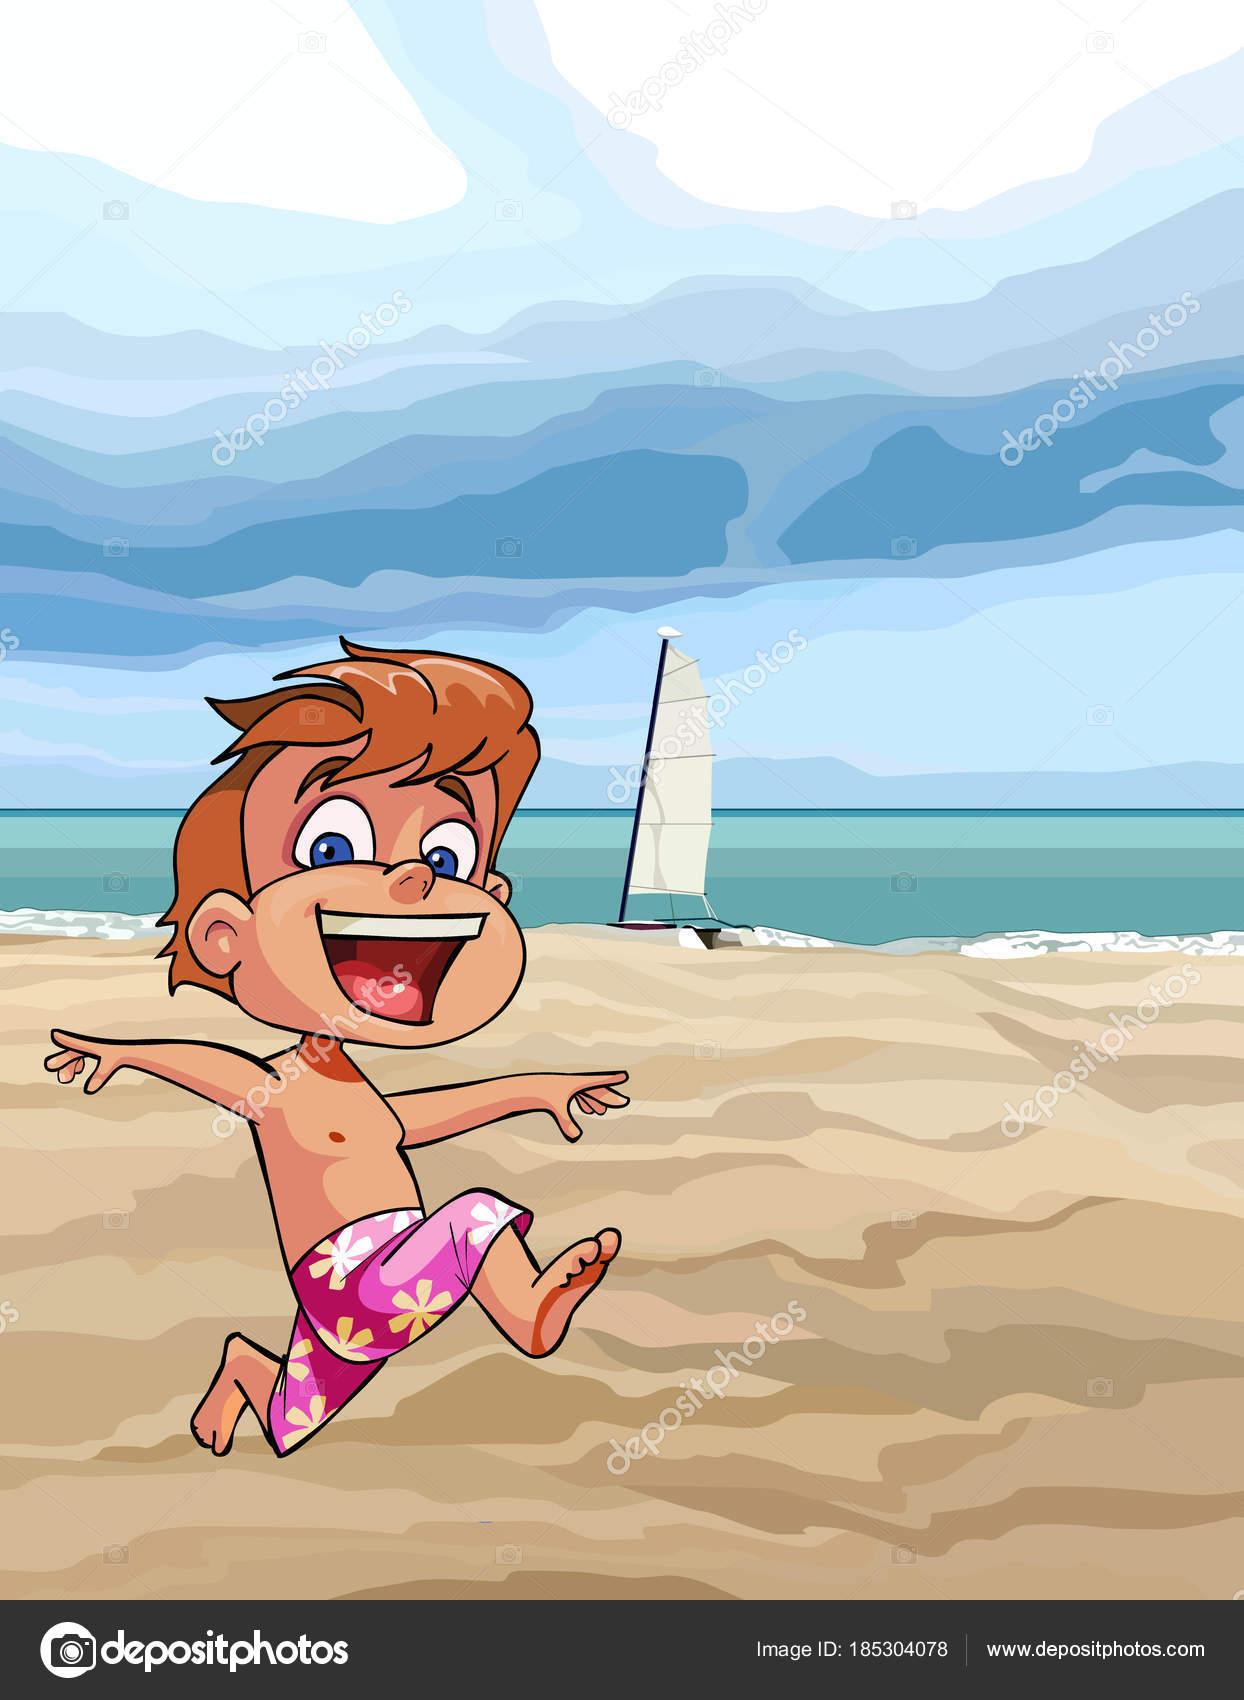 Cartoon joyful boy running along the beach stock vector cartoon joyful boy running along the sandy beach vector by westamult voltagebd Choice Image